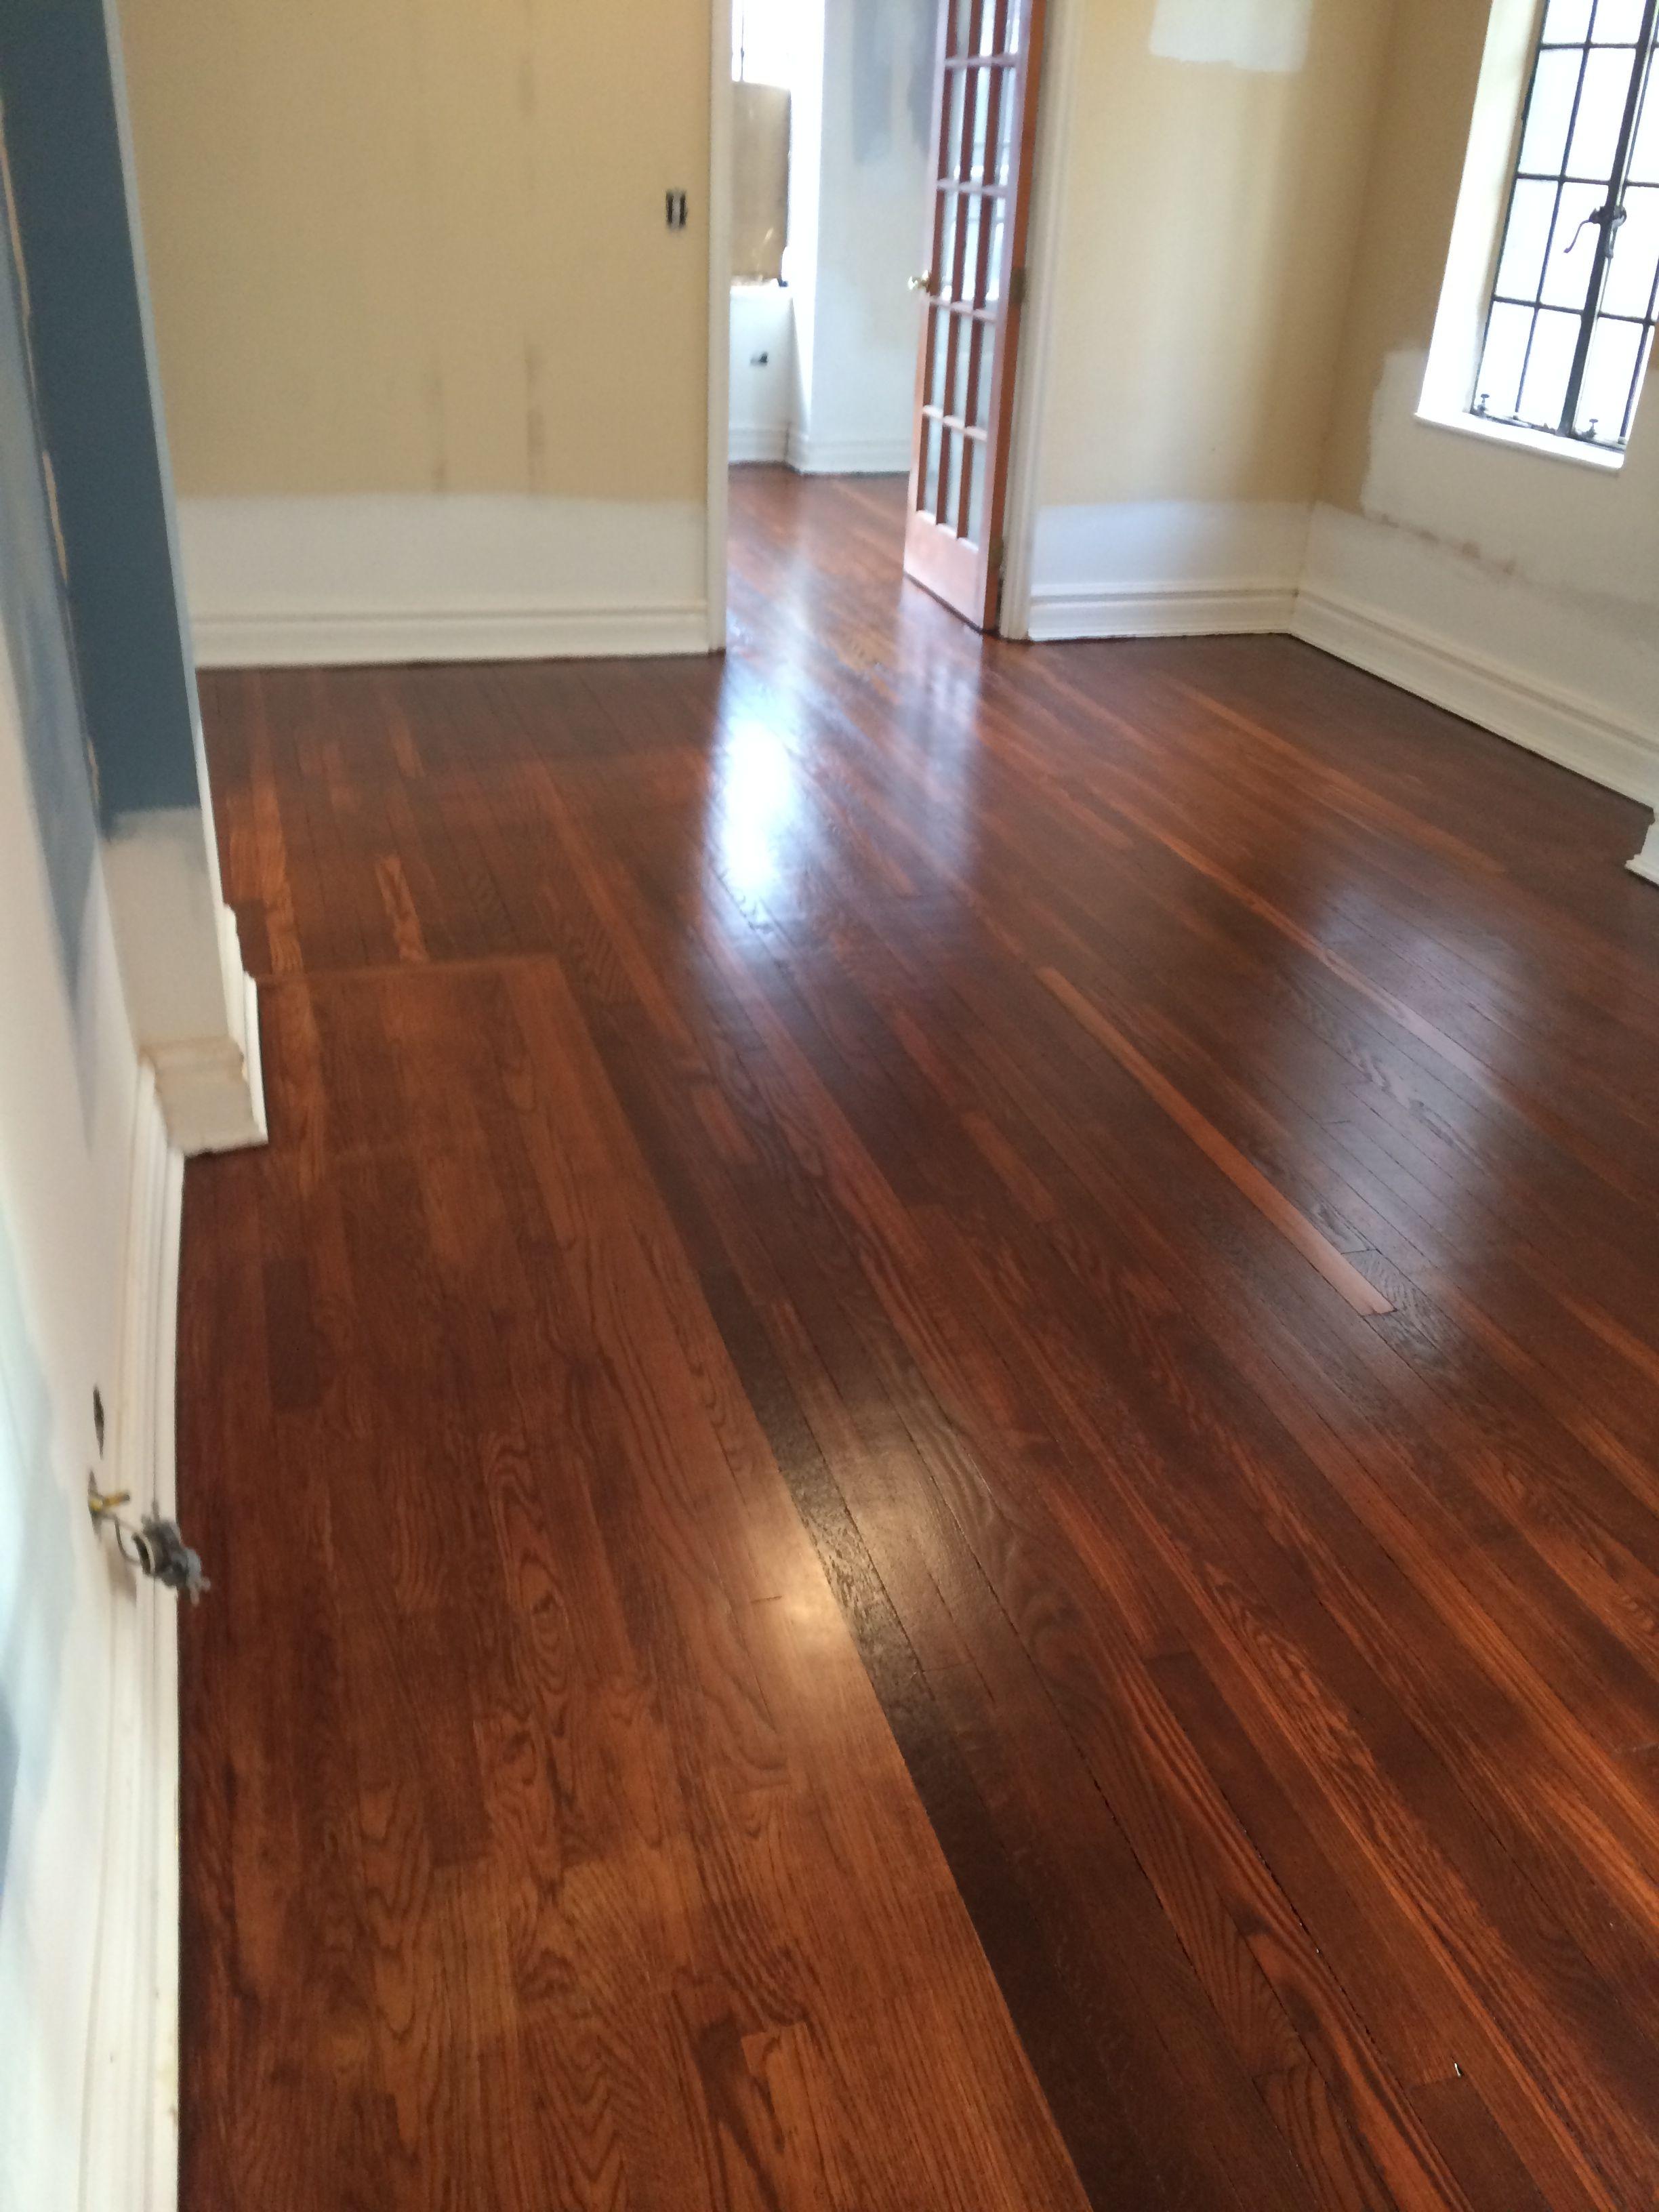 American Walnut Stain Floors Floor Walnut Stain